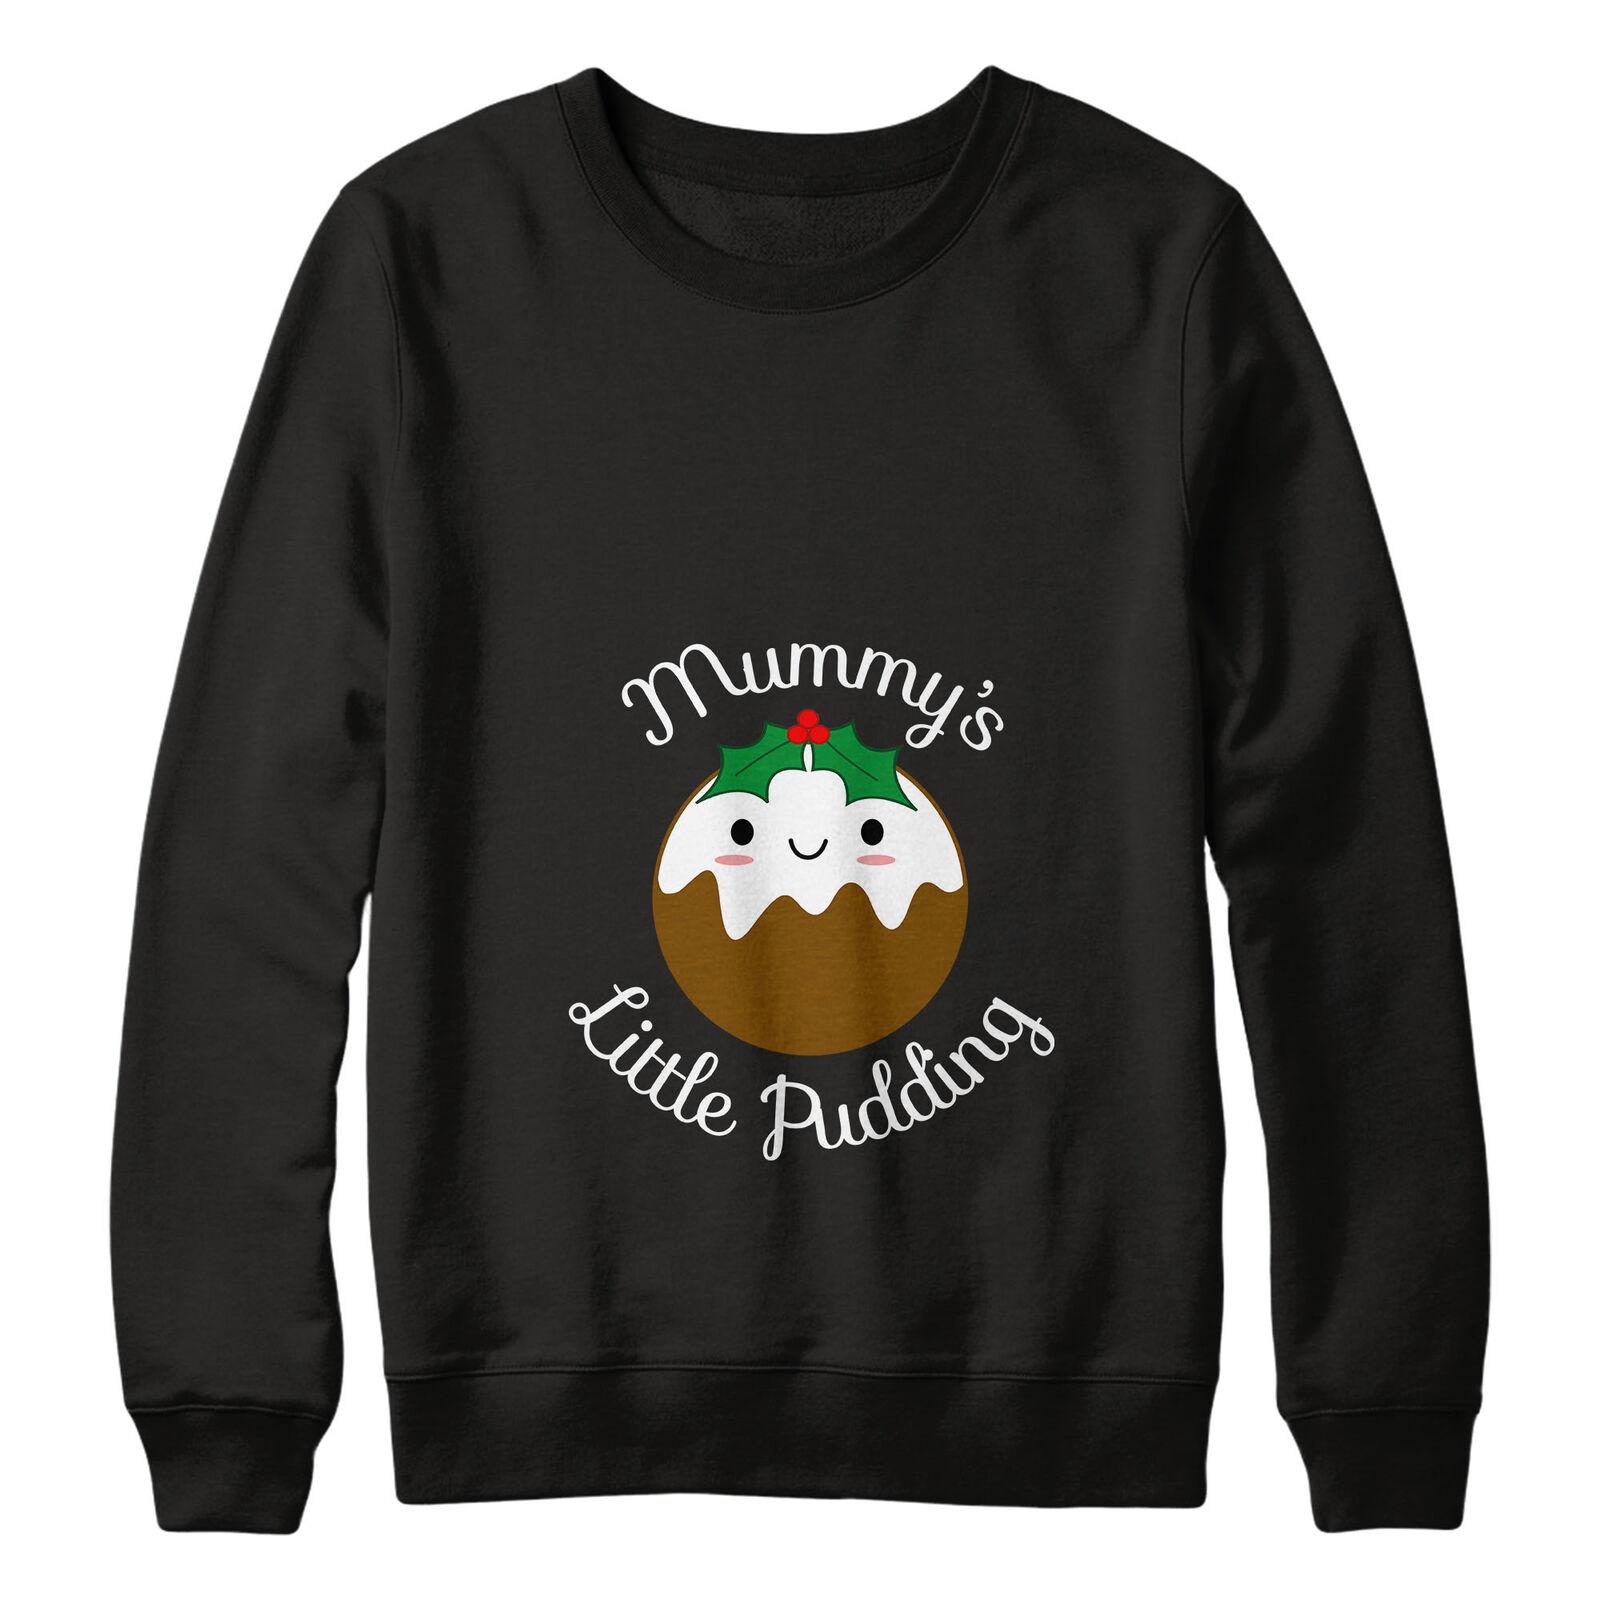 Mummy's Little Pudding Christmas Jumper Sweatshirt Women Pregnant Maternity L164